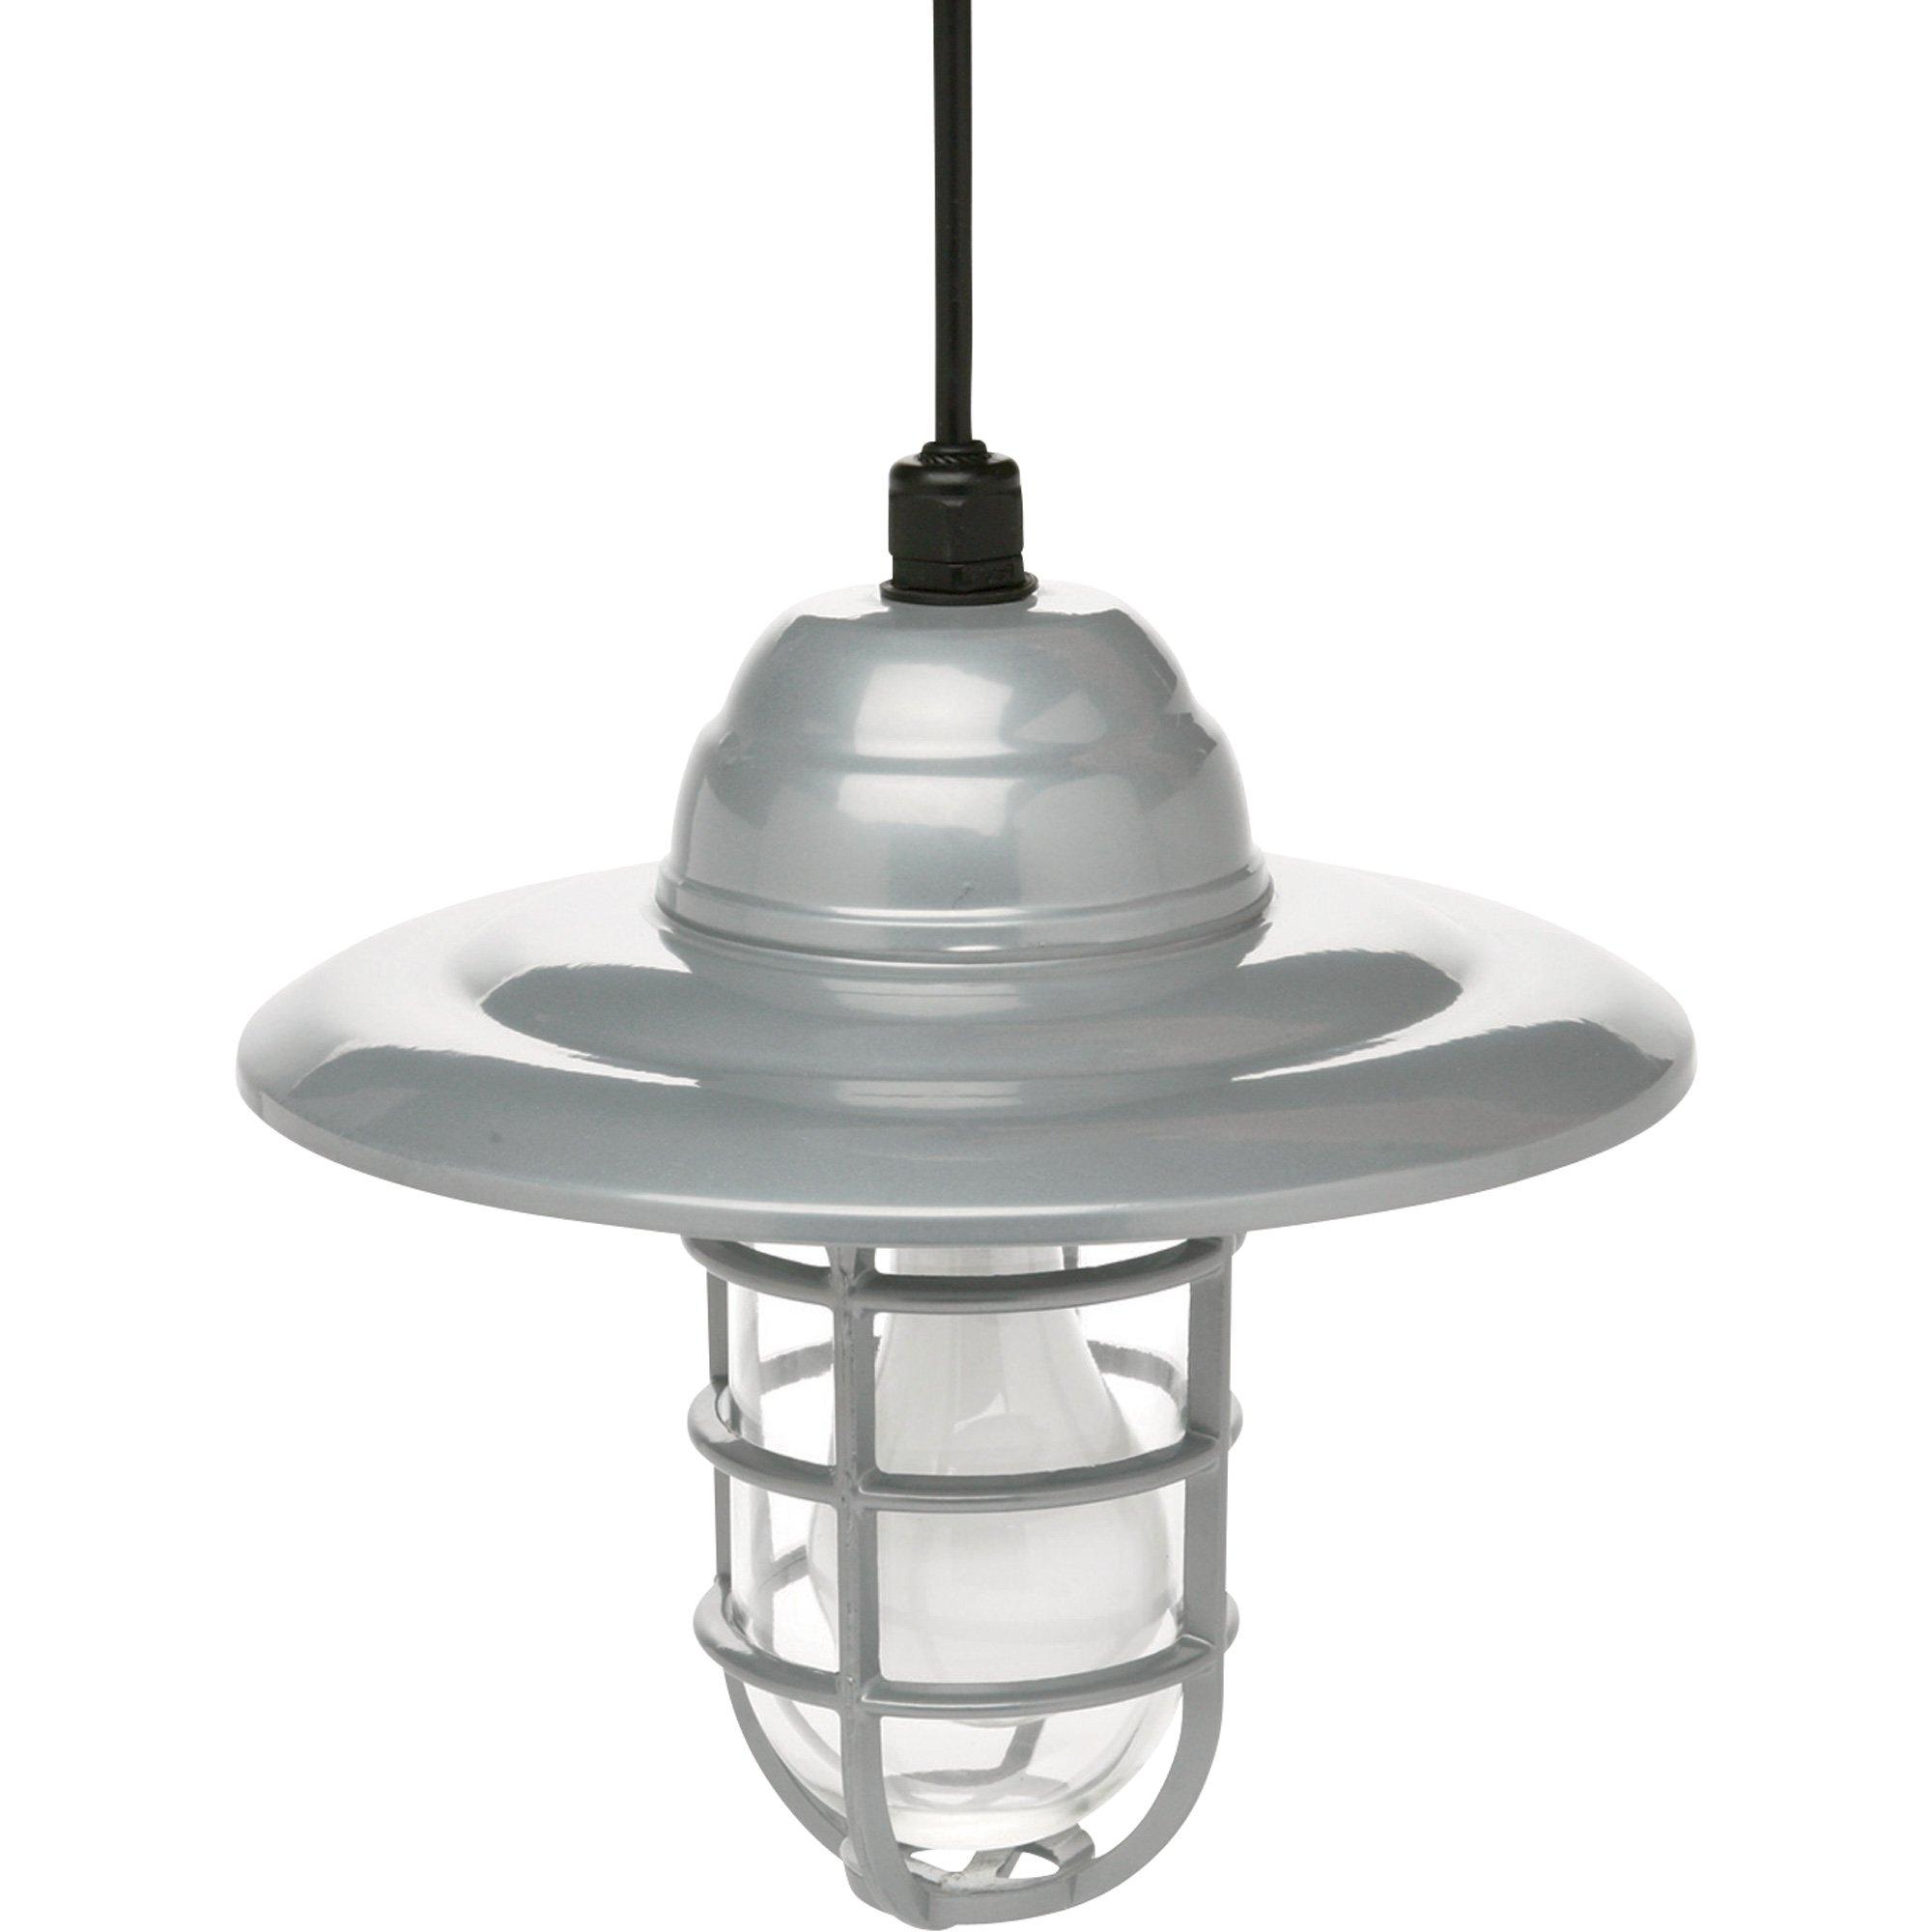 Designers Edge Hanging Outdoor Barn Light — 10in (View 6 of 15)